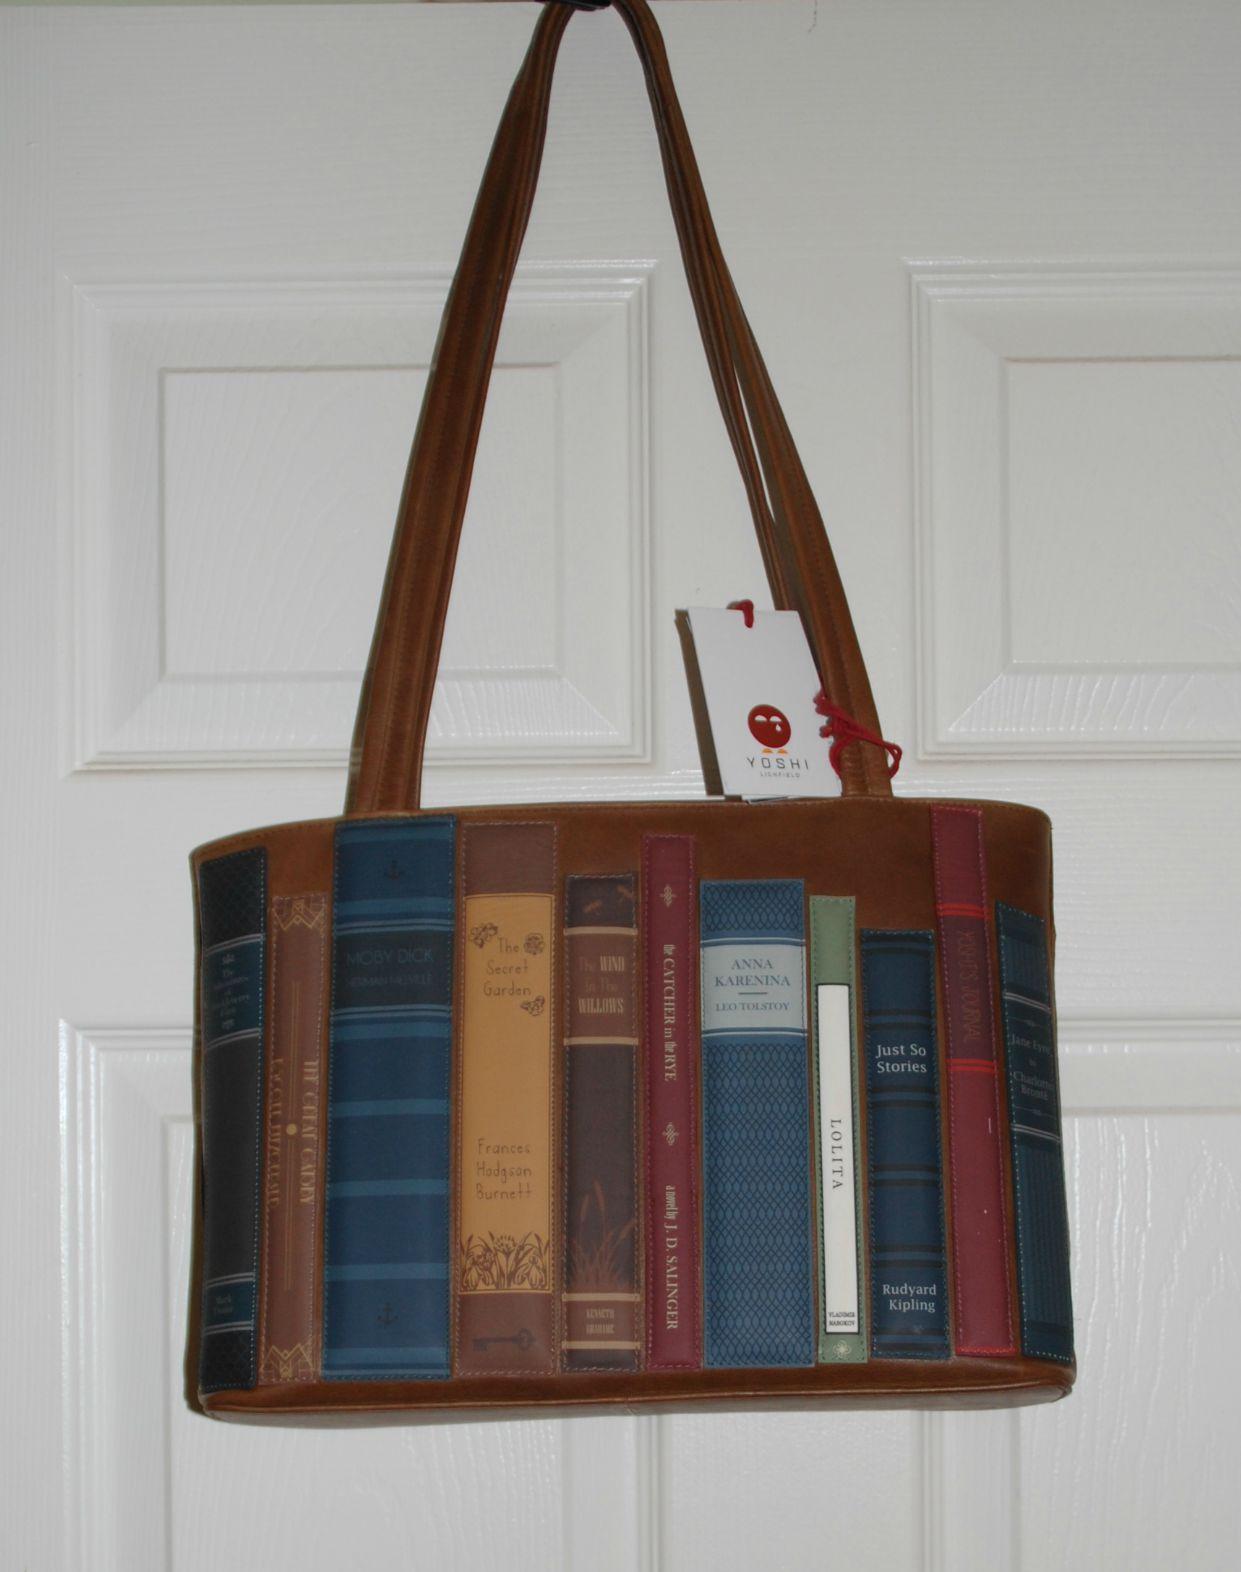 yoshi bookworm bag